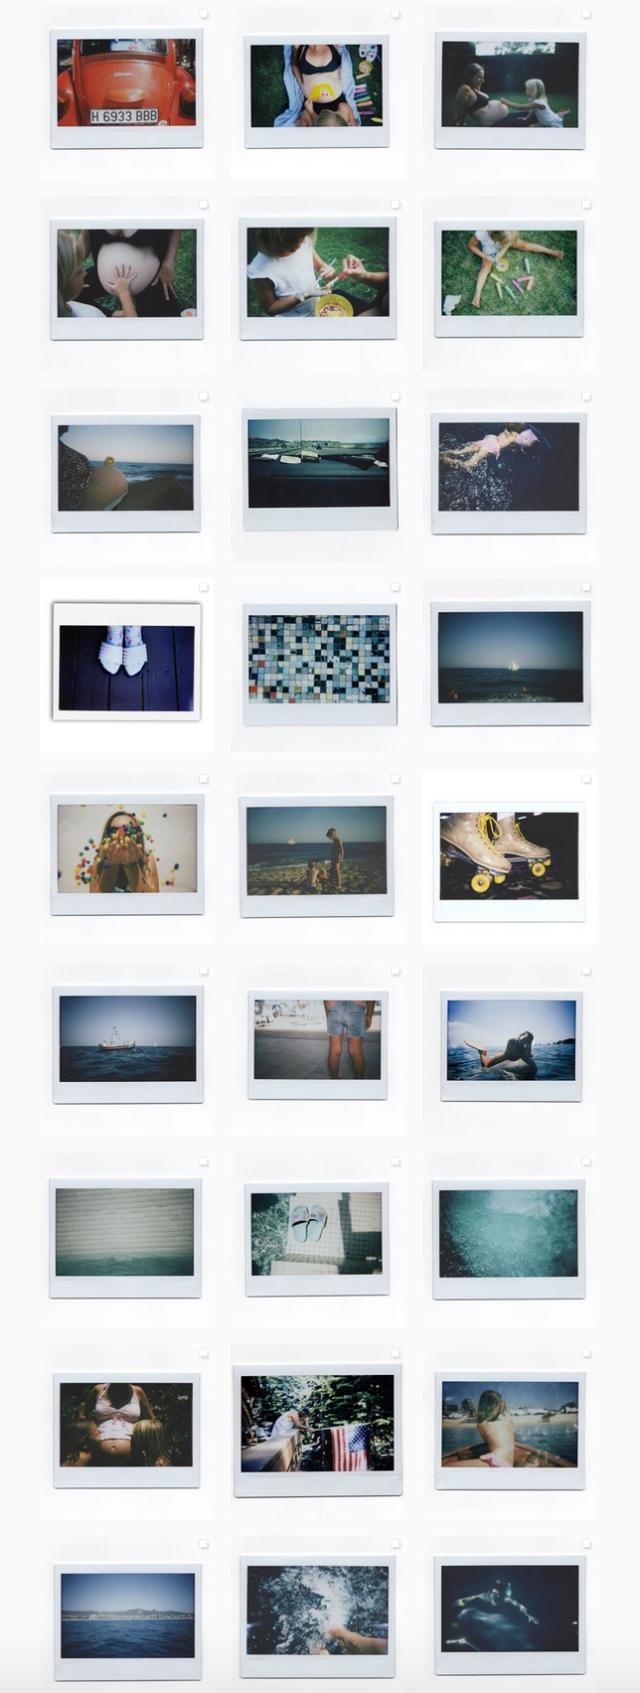 mariaferresamat_magiclomo_instantphotography_polaroid_lomography